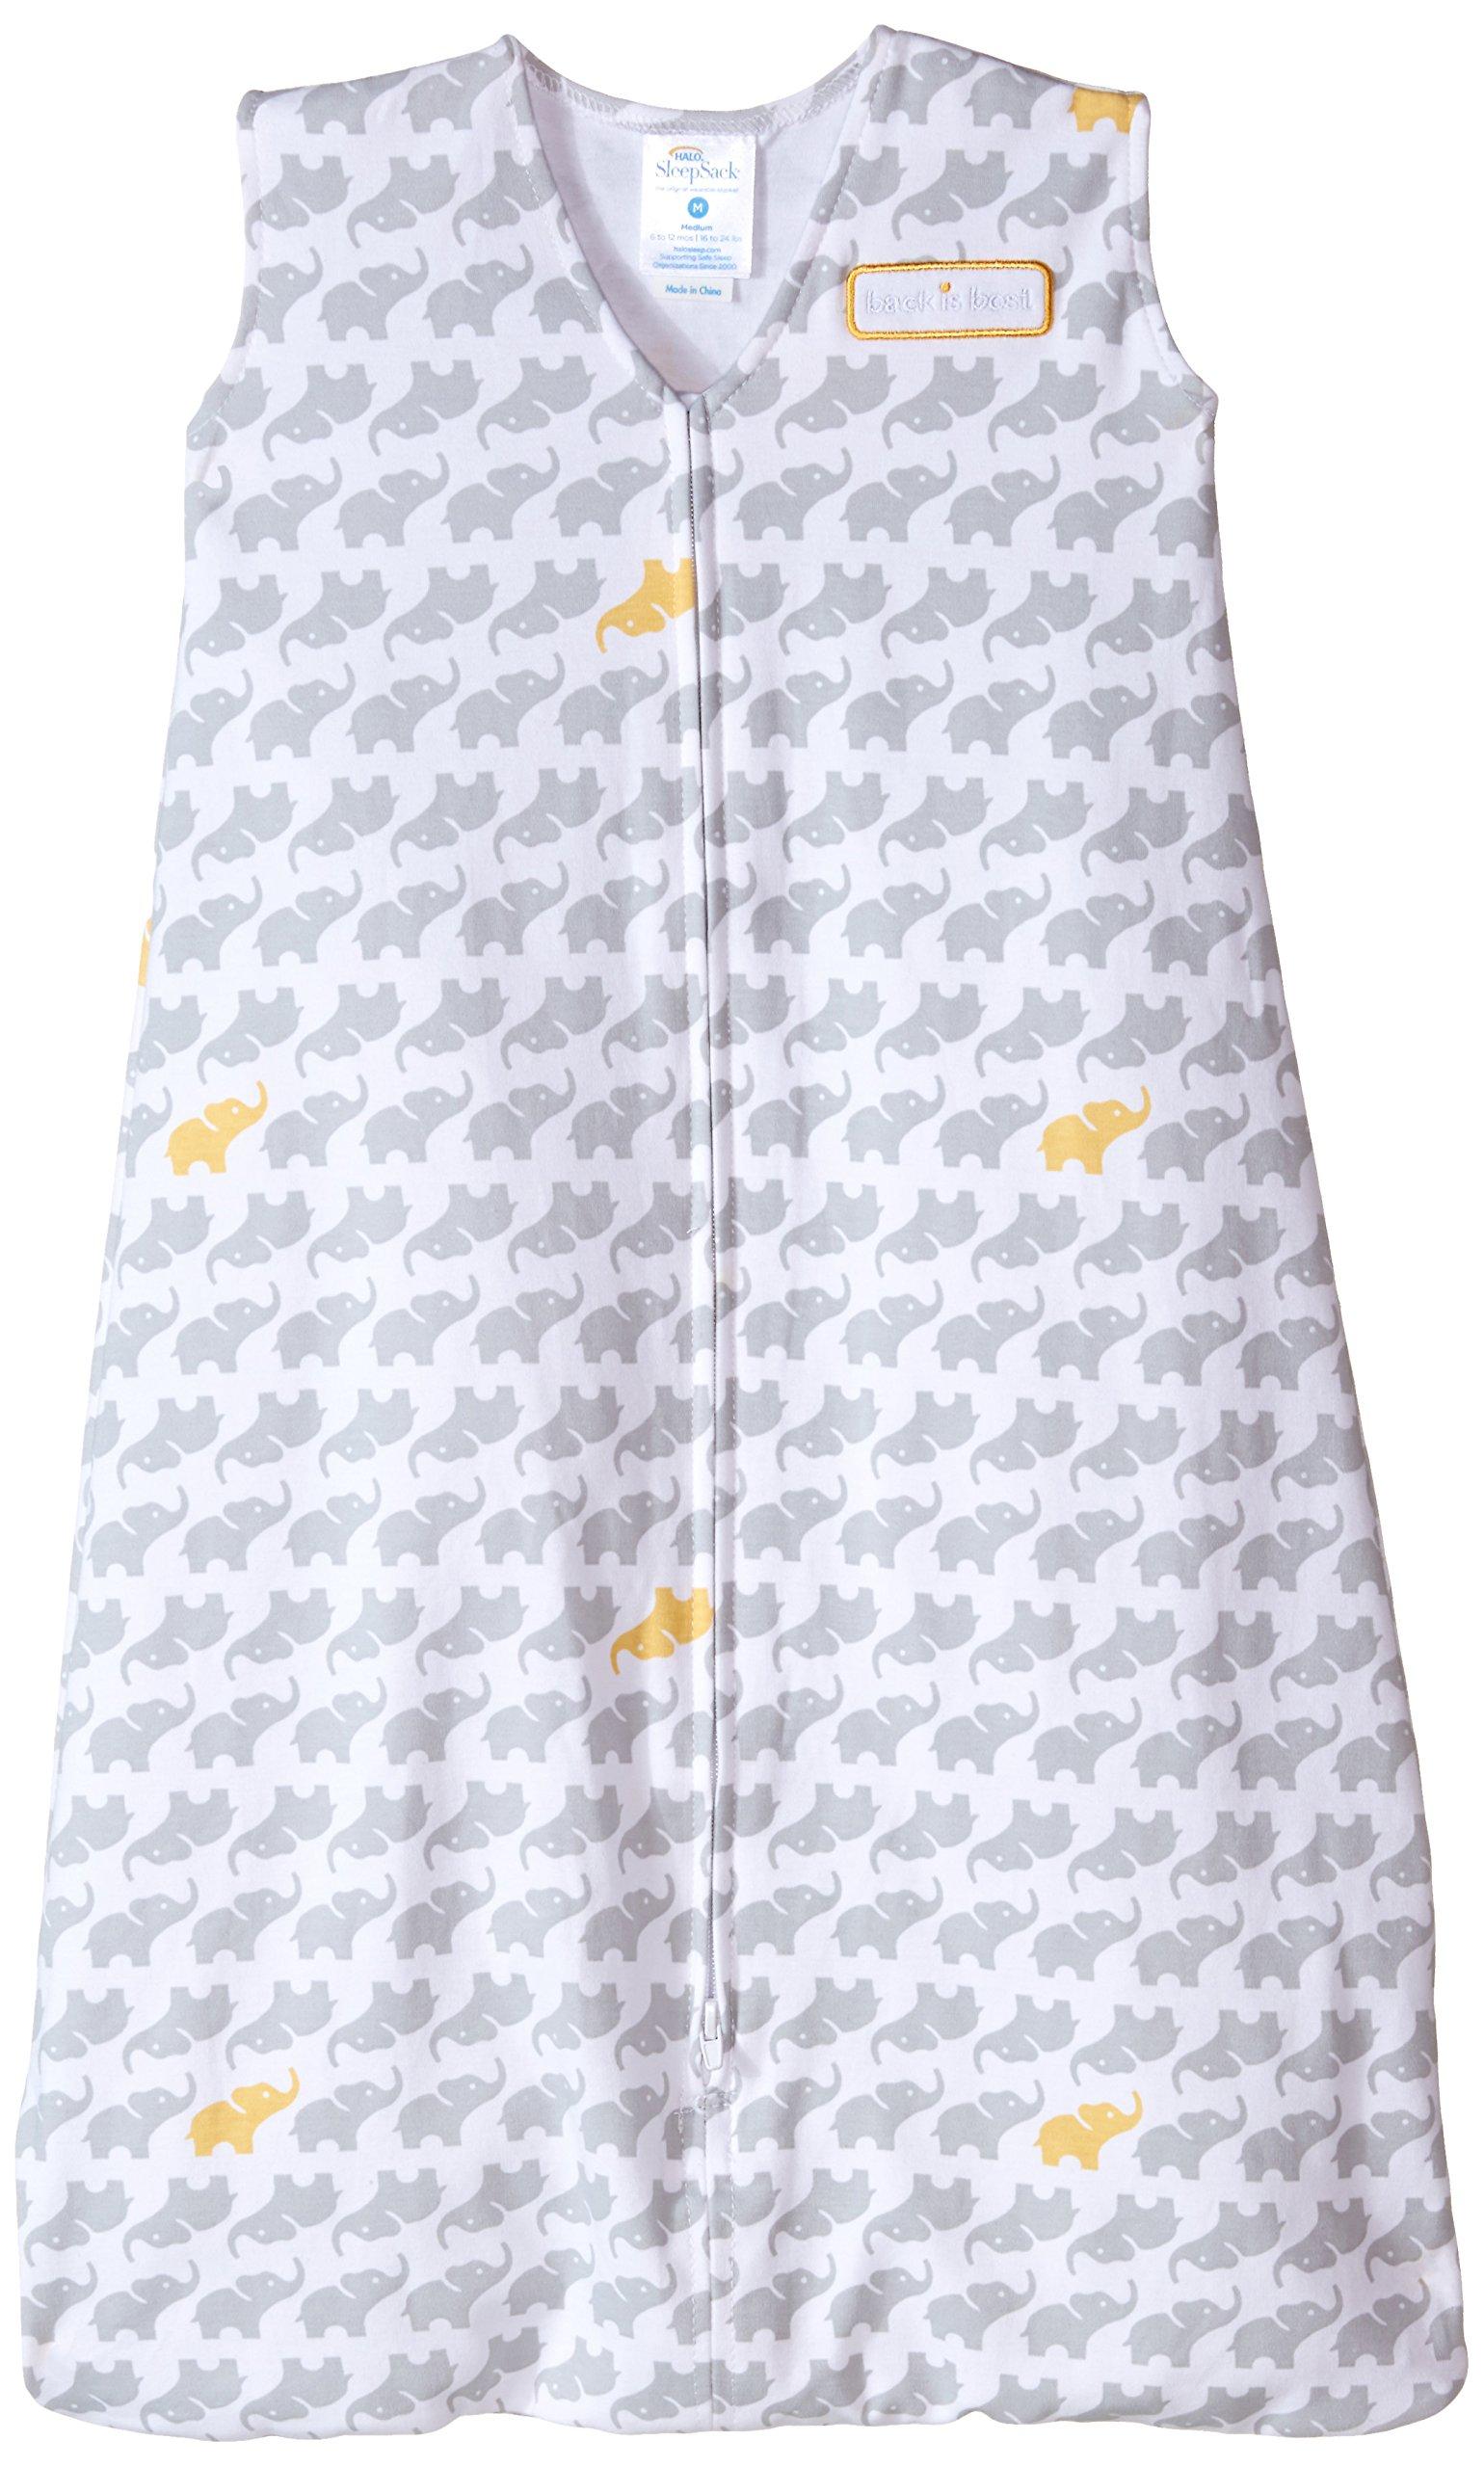 HALO SleepSack 100% Cotton Wearable Blanket, Gray Elephant Graphics, Medium